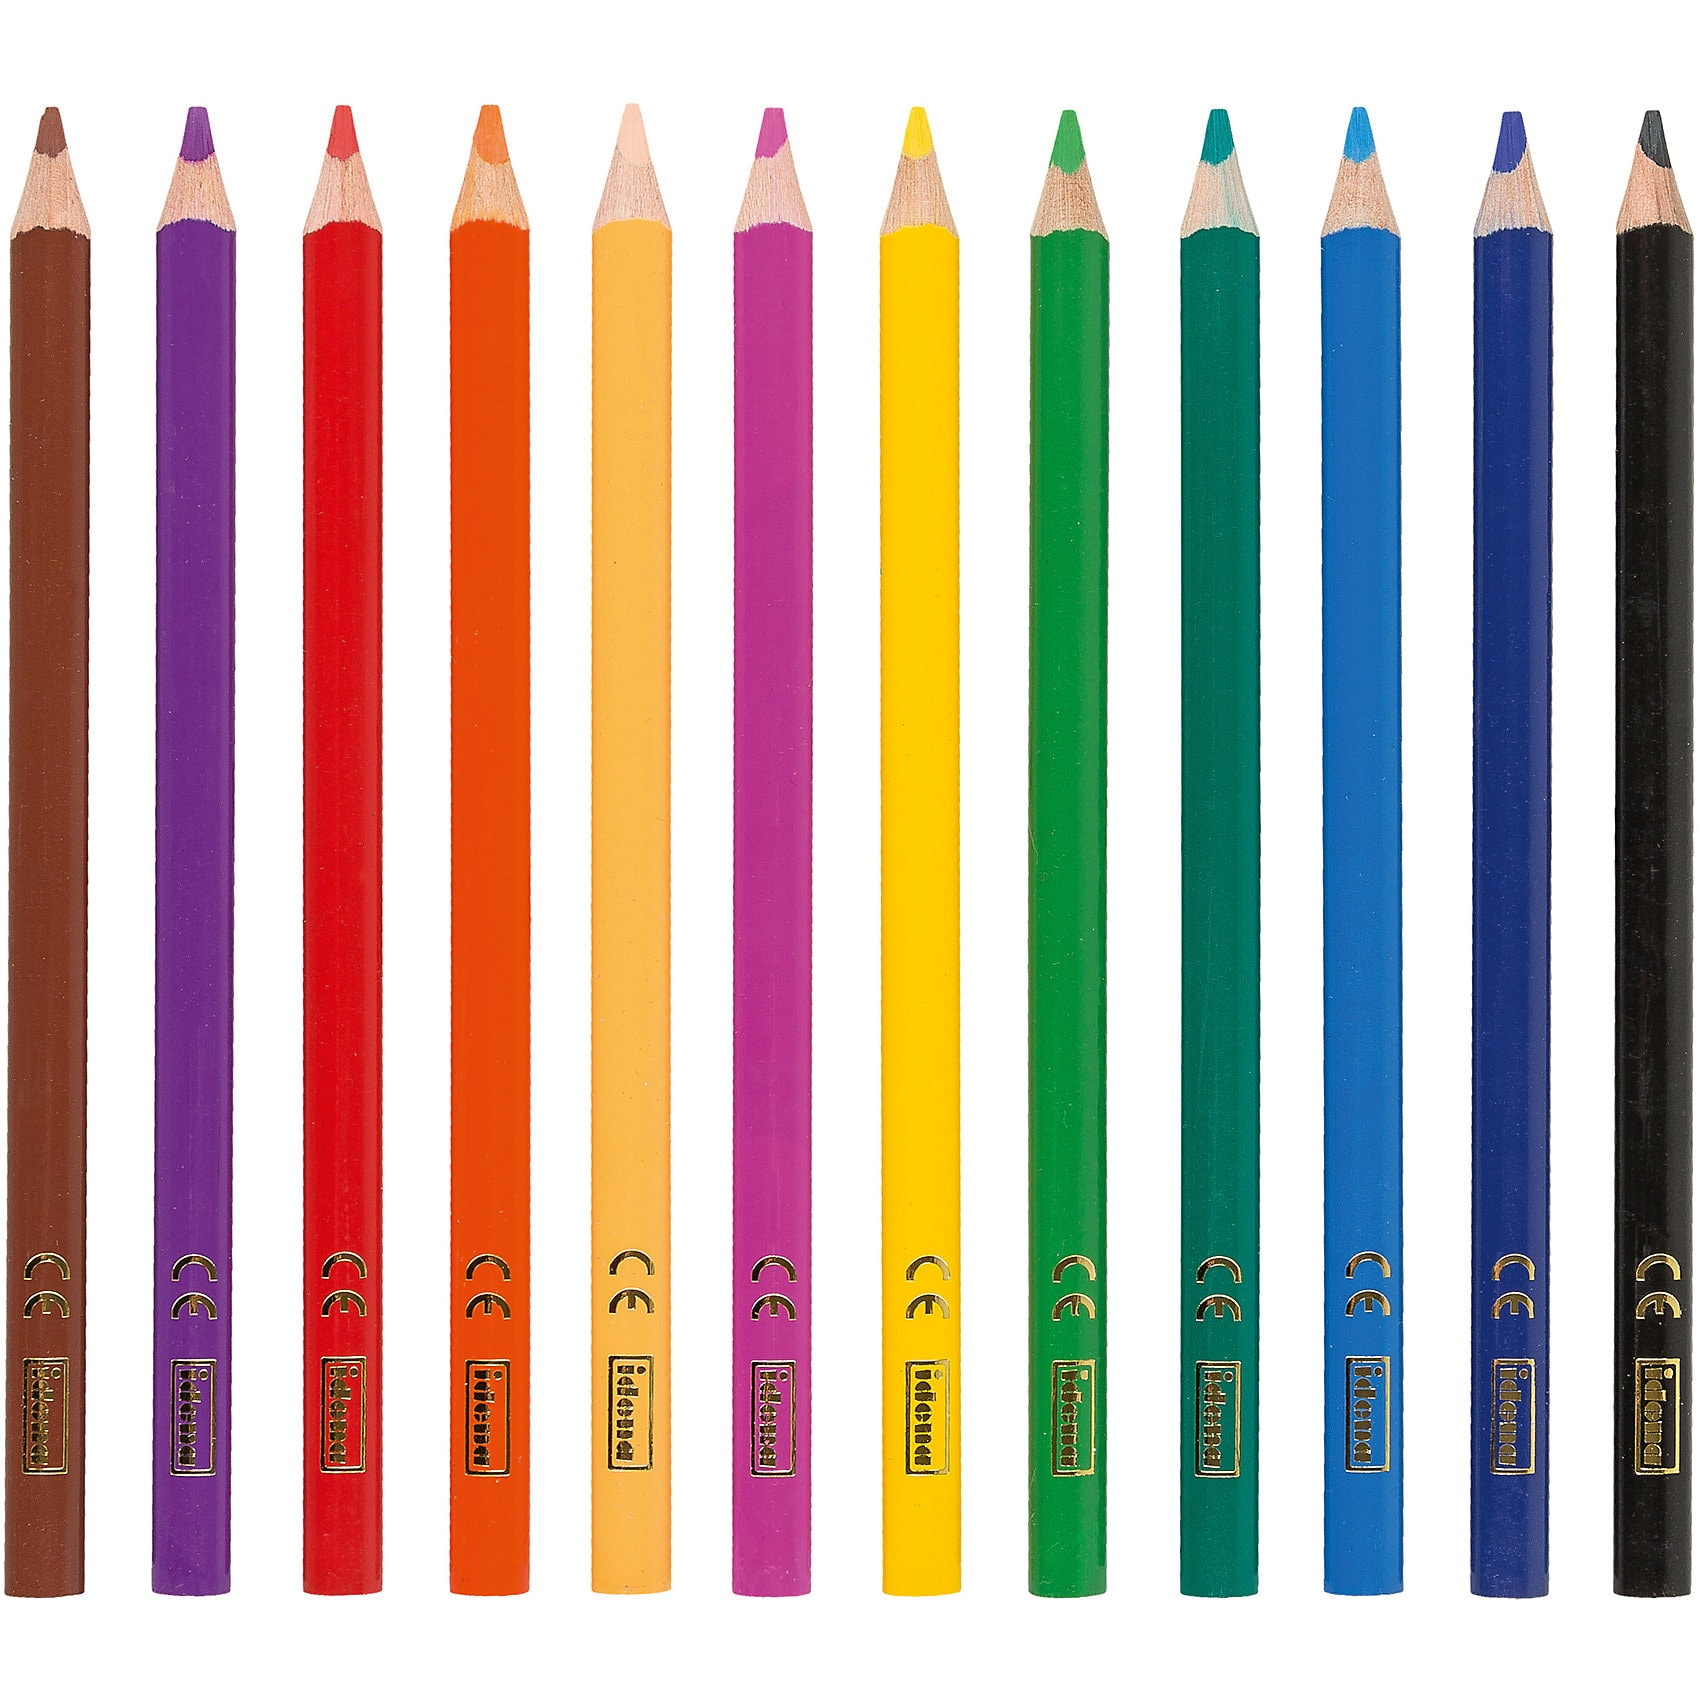 Idena Buntstifte 12 Farben